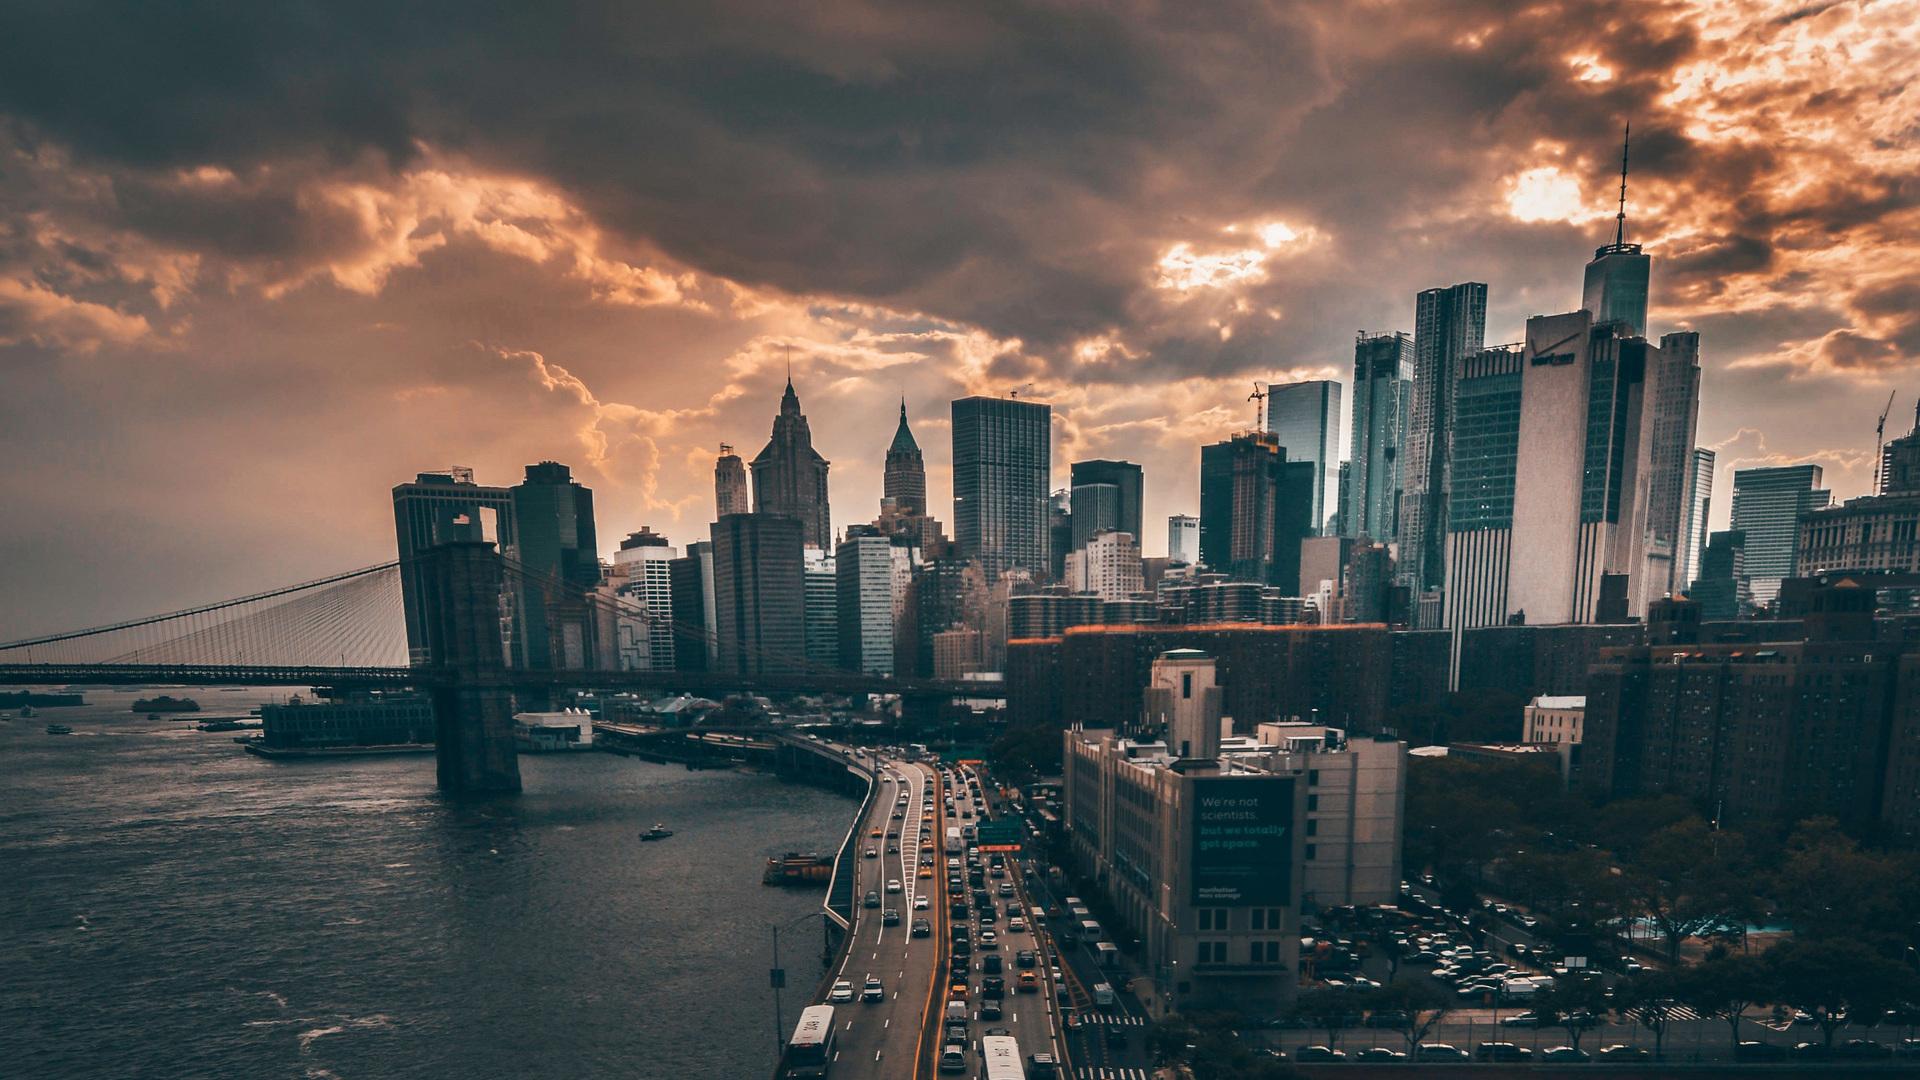 1920x1080 manhattan new york city 4k laptop full hd 1080p hd 4k wallpapers images backgrounds - Wallpaper 1080p new york ...